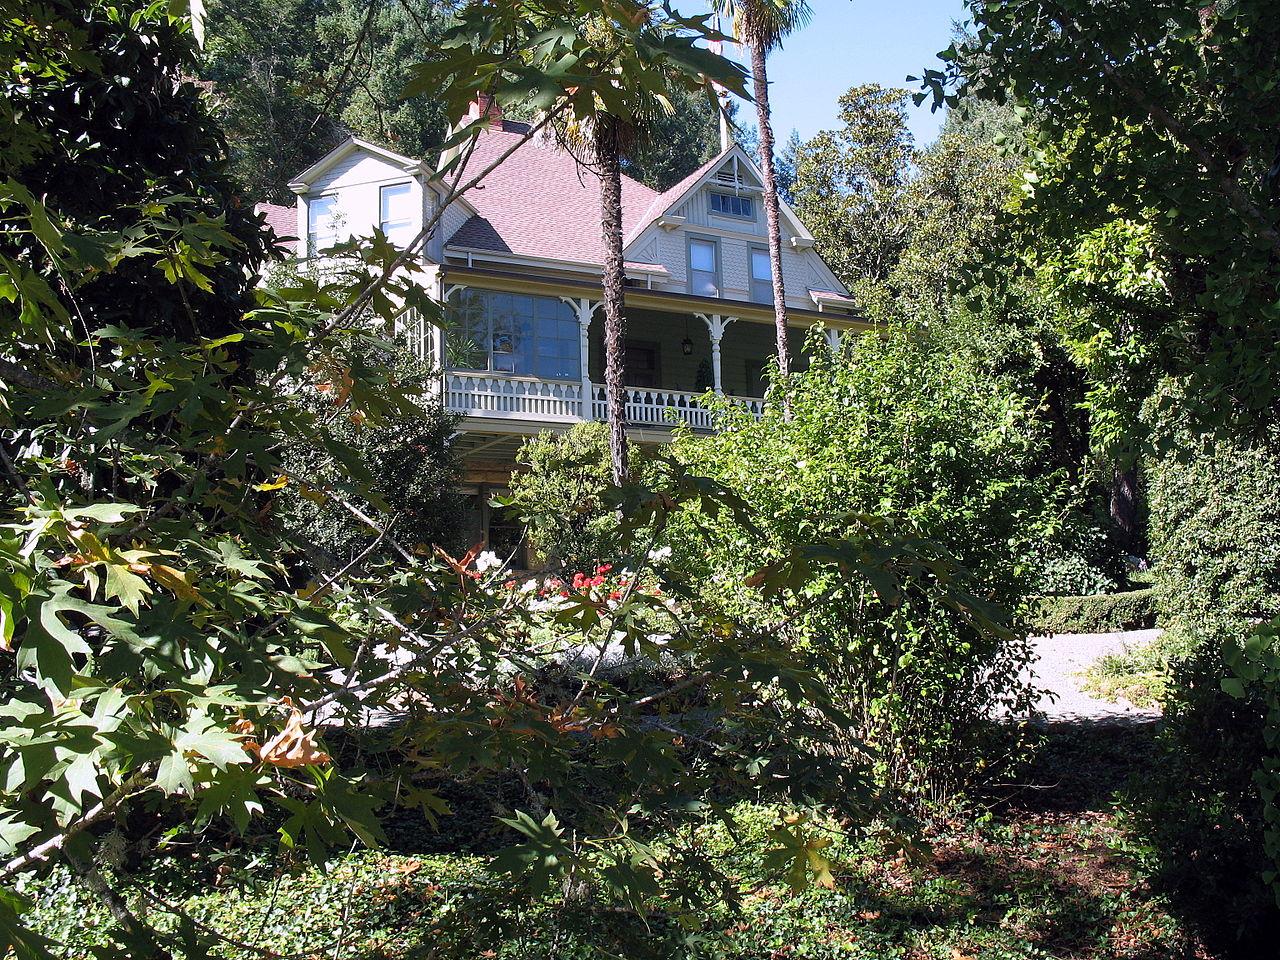 Napa County Property Tax Liens